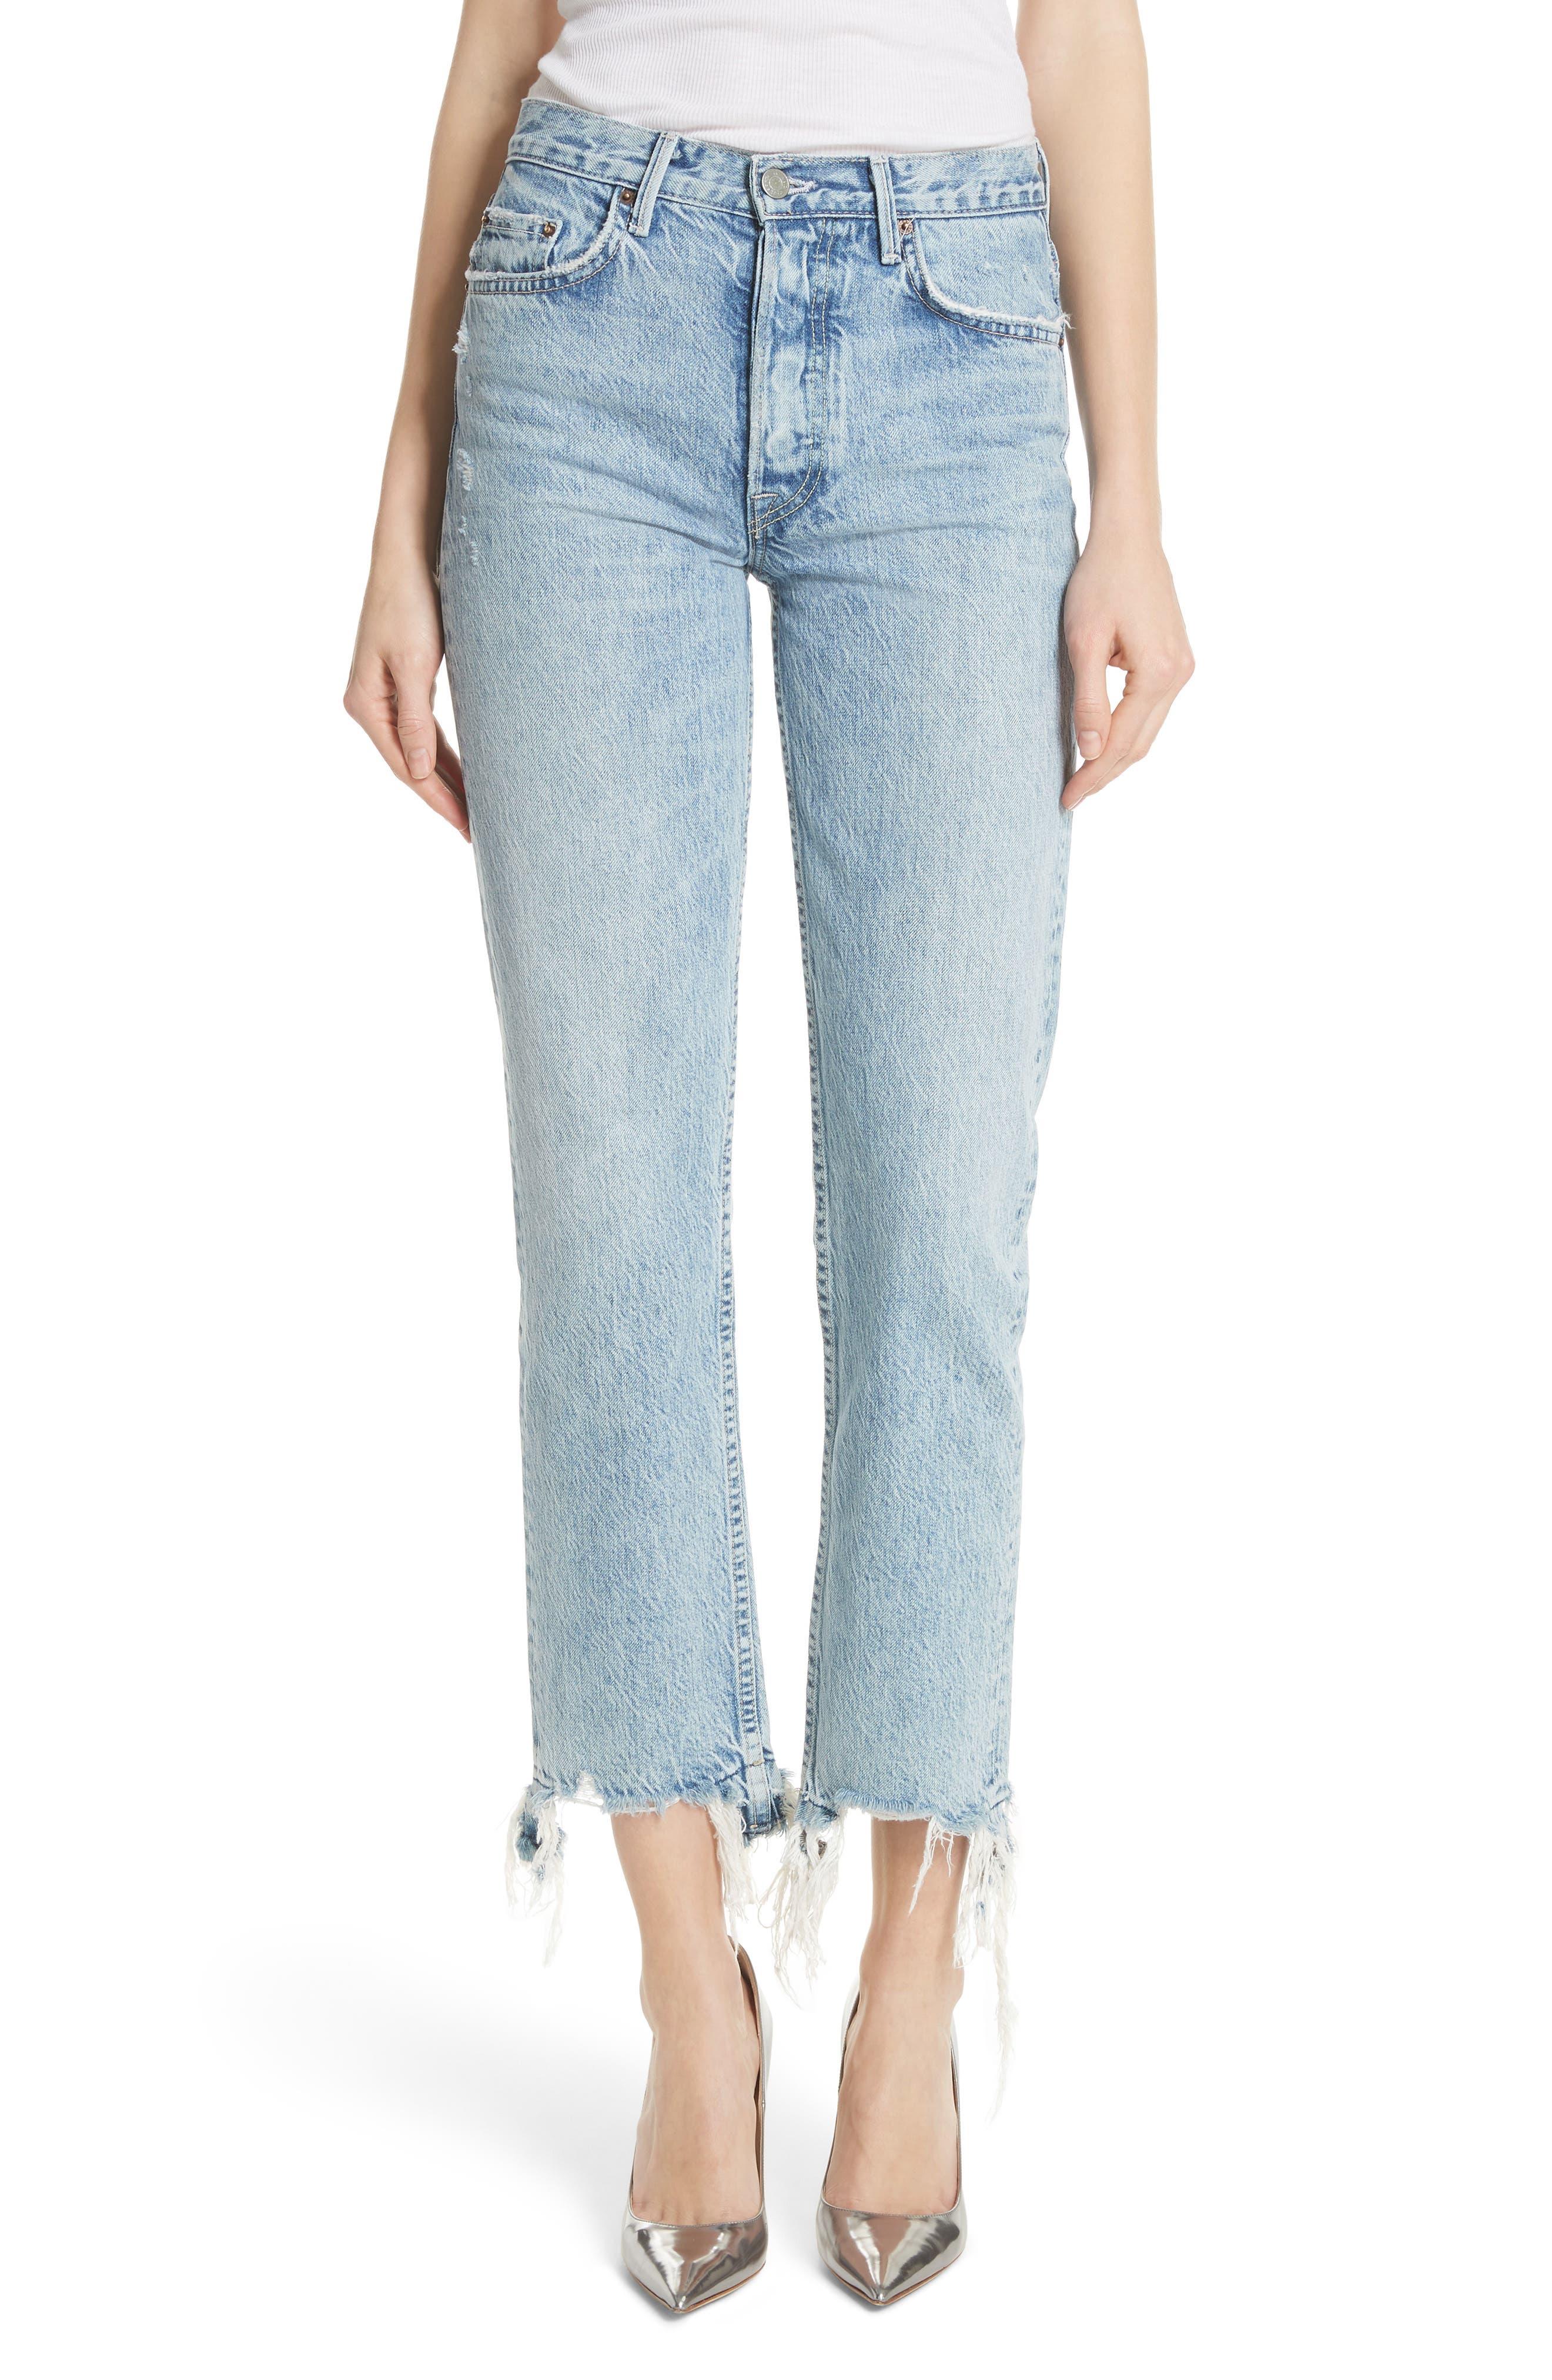 GRLFRND Helena Frayed Hem High Waist Jeans, Main, color, 401